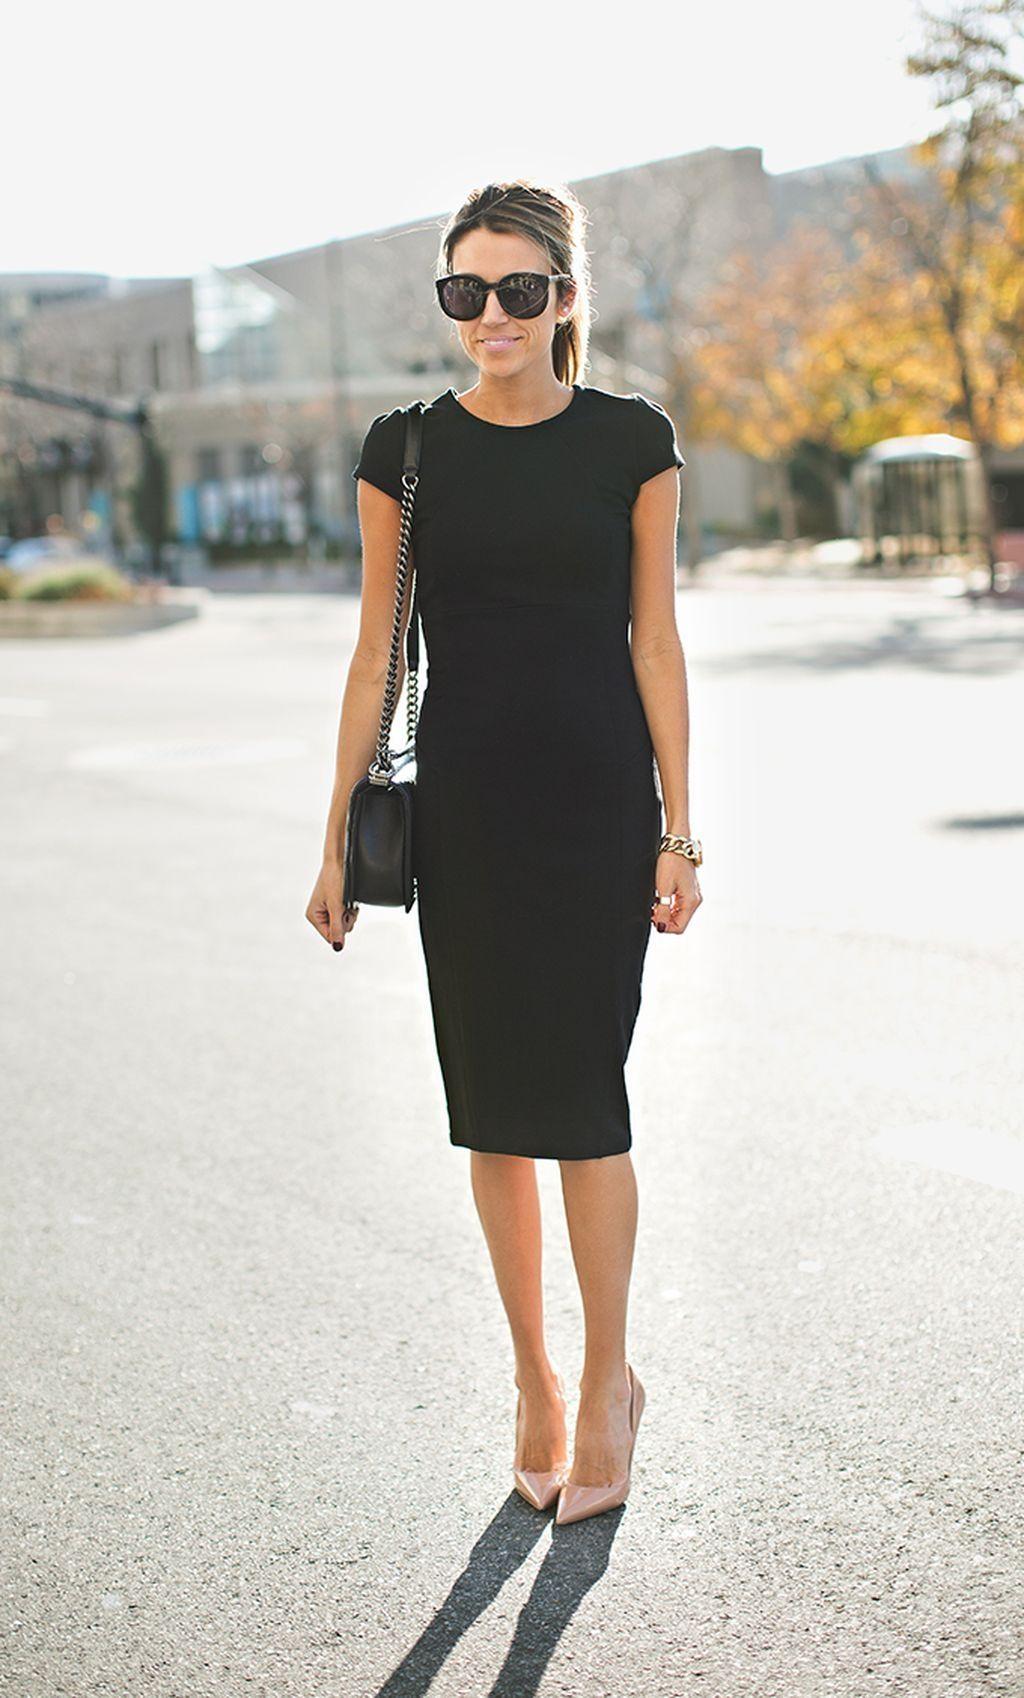 5037baab870 Pin by Natasa on Outfits | Black dress outfits, Black pencil dress ...